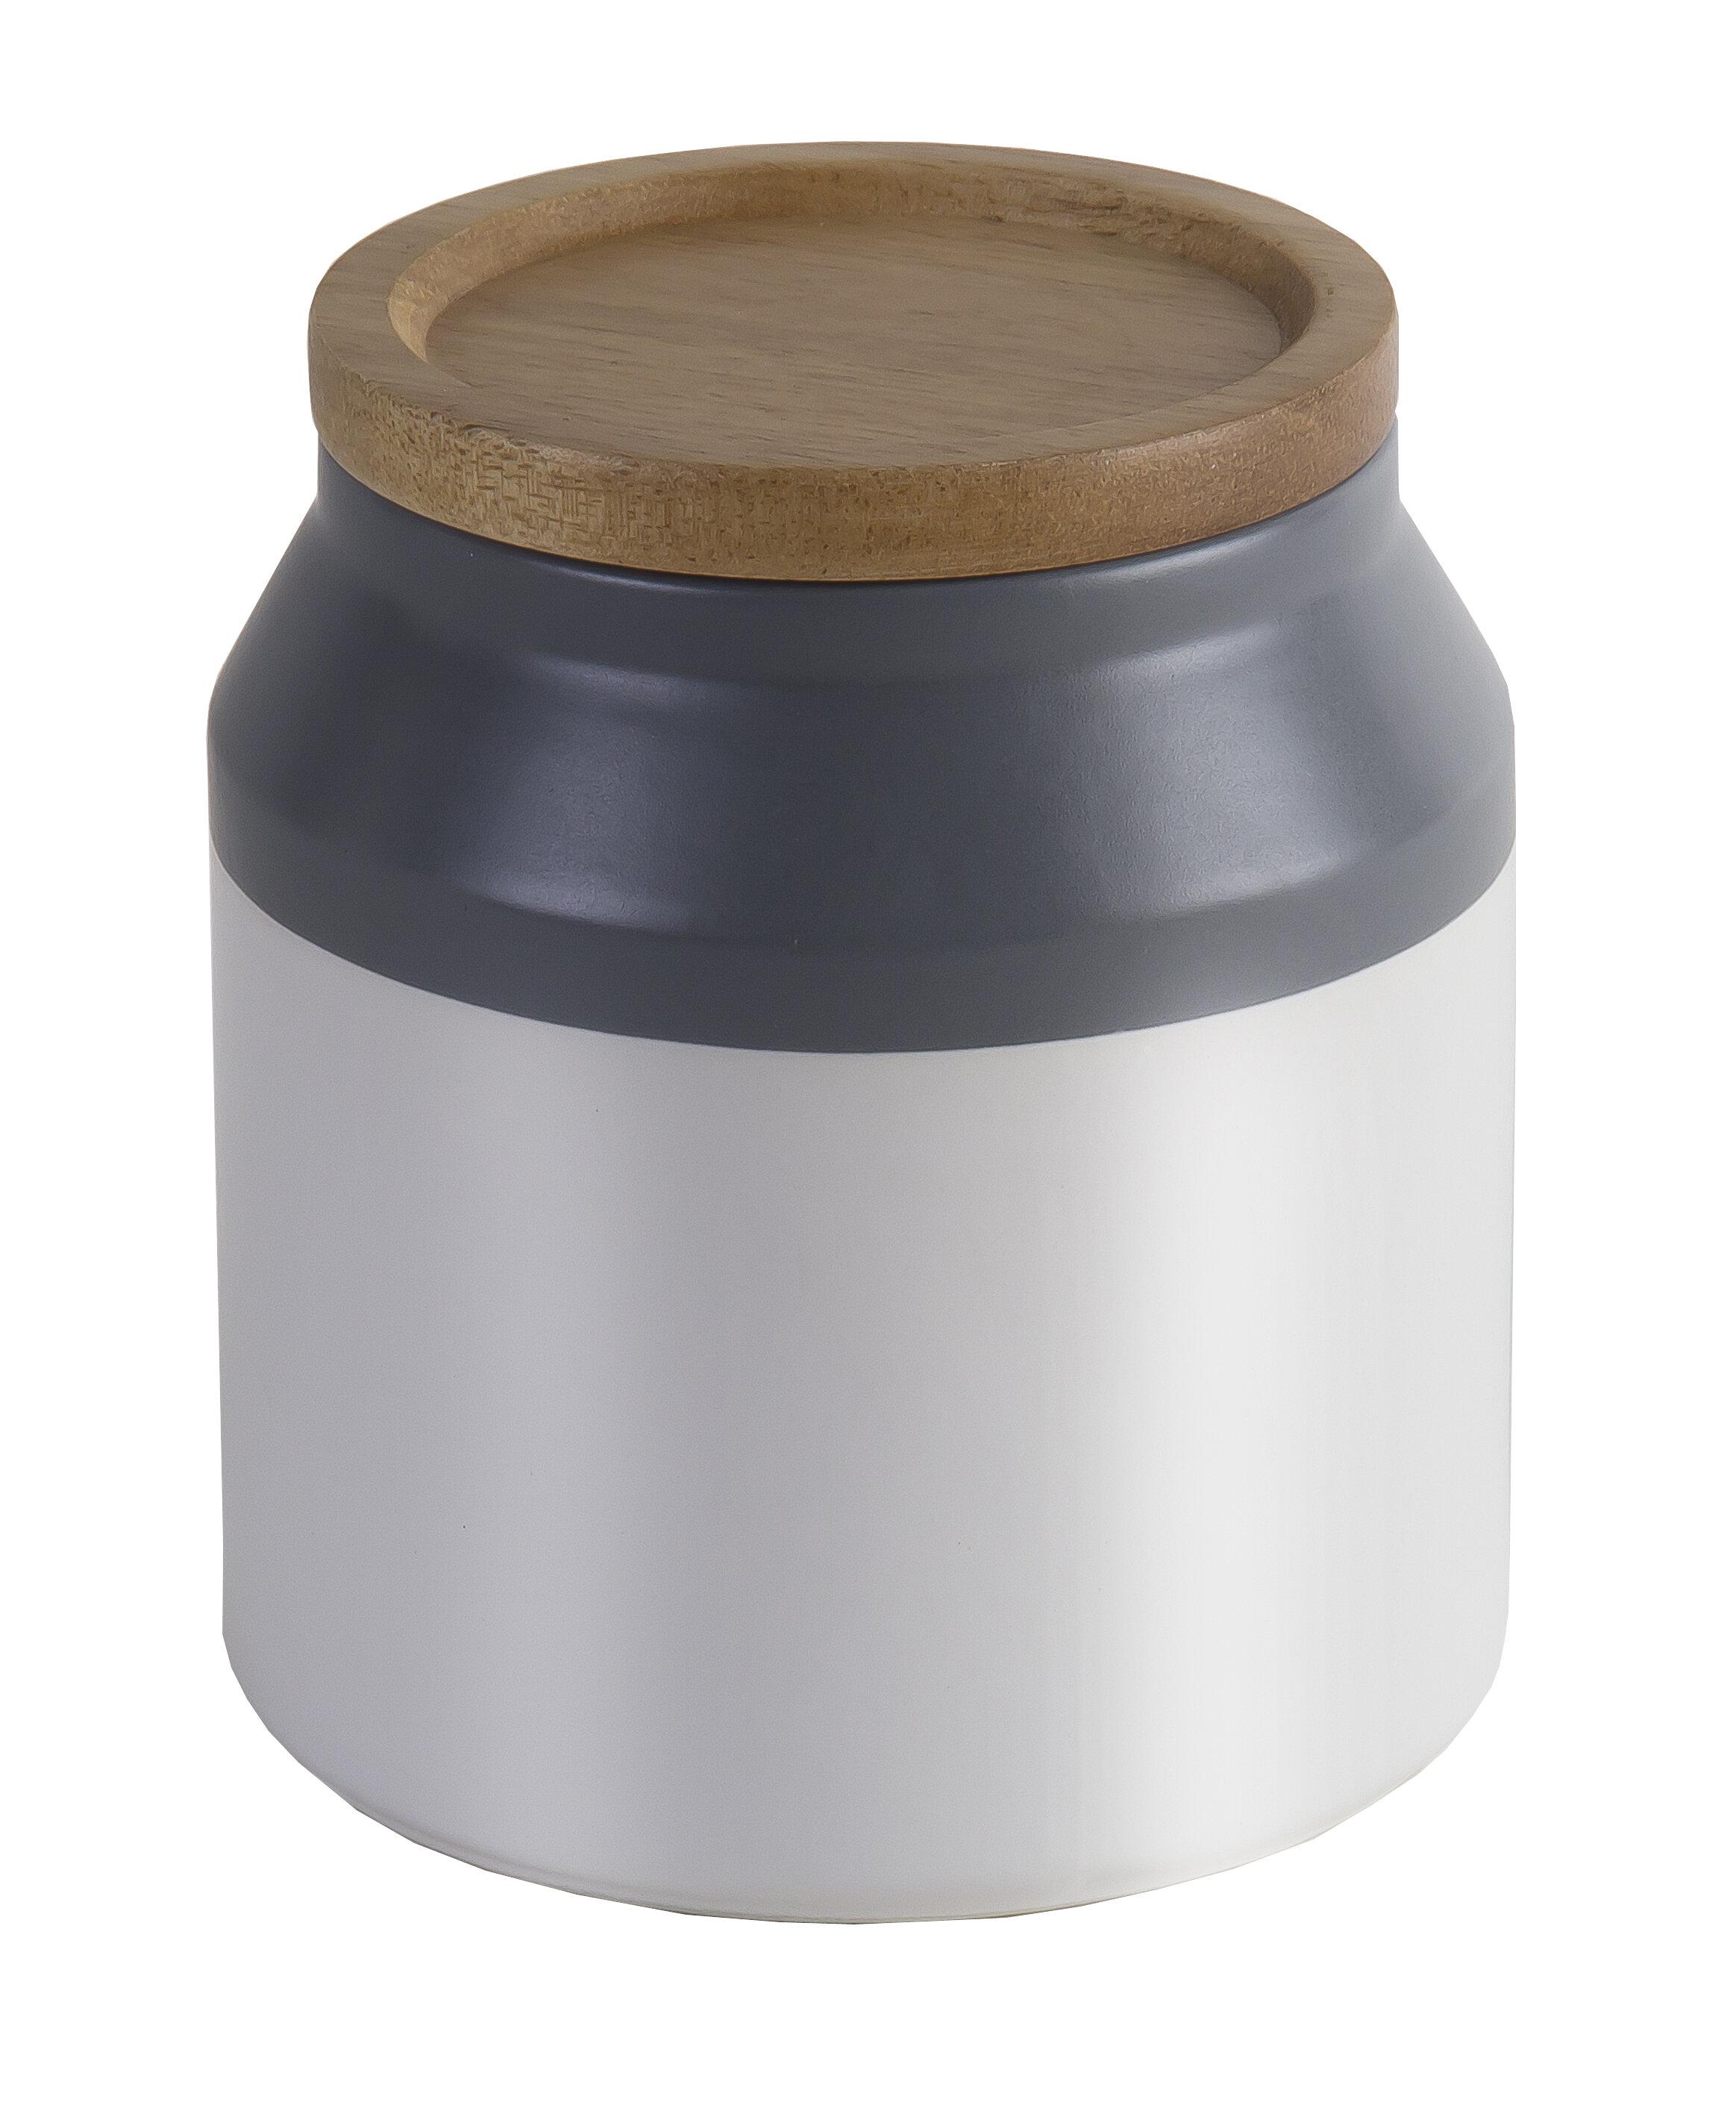 Jamie Oliver Ceramic Storage Jar With